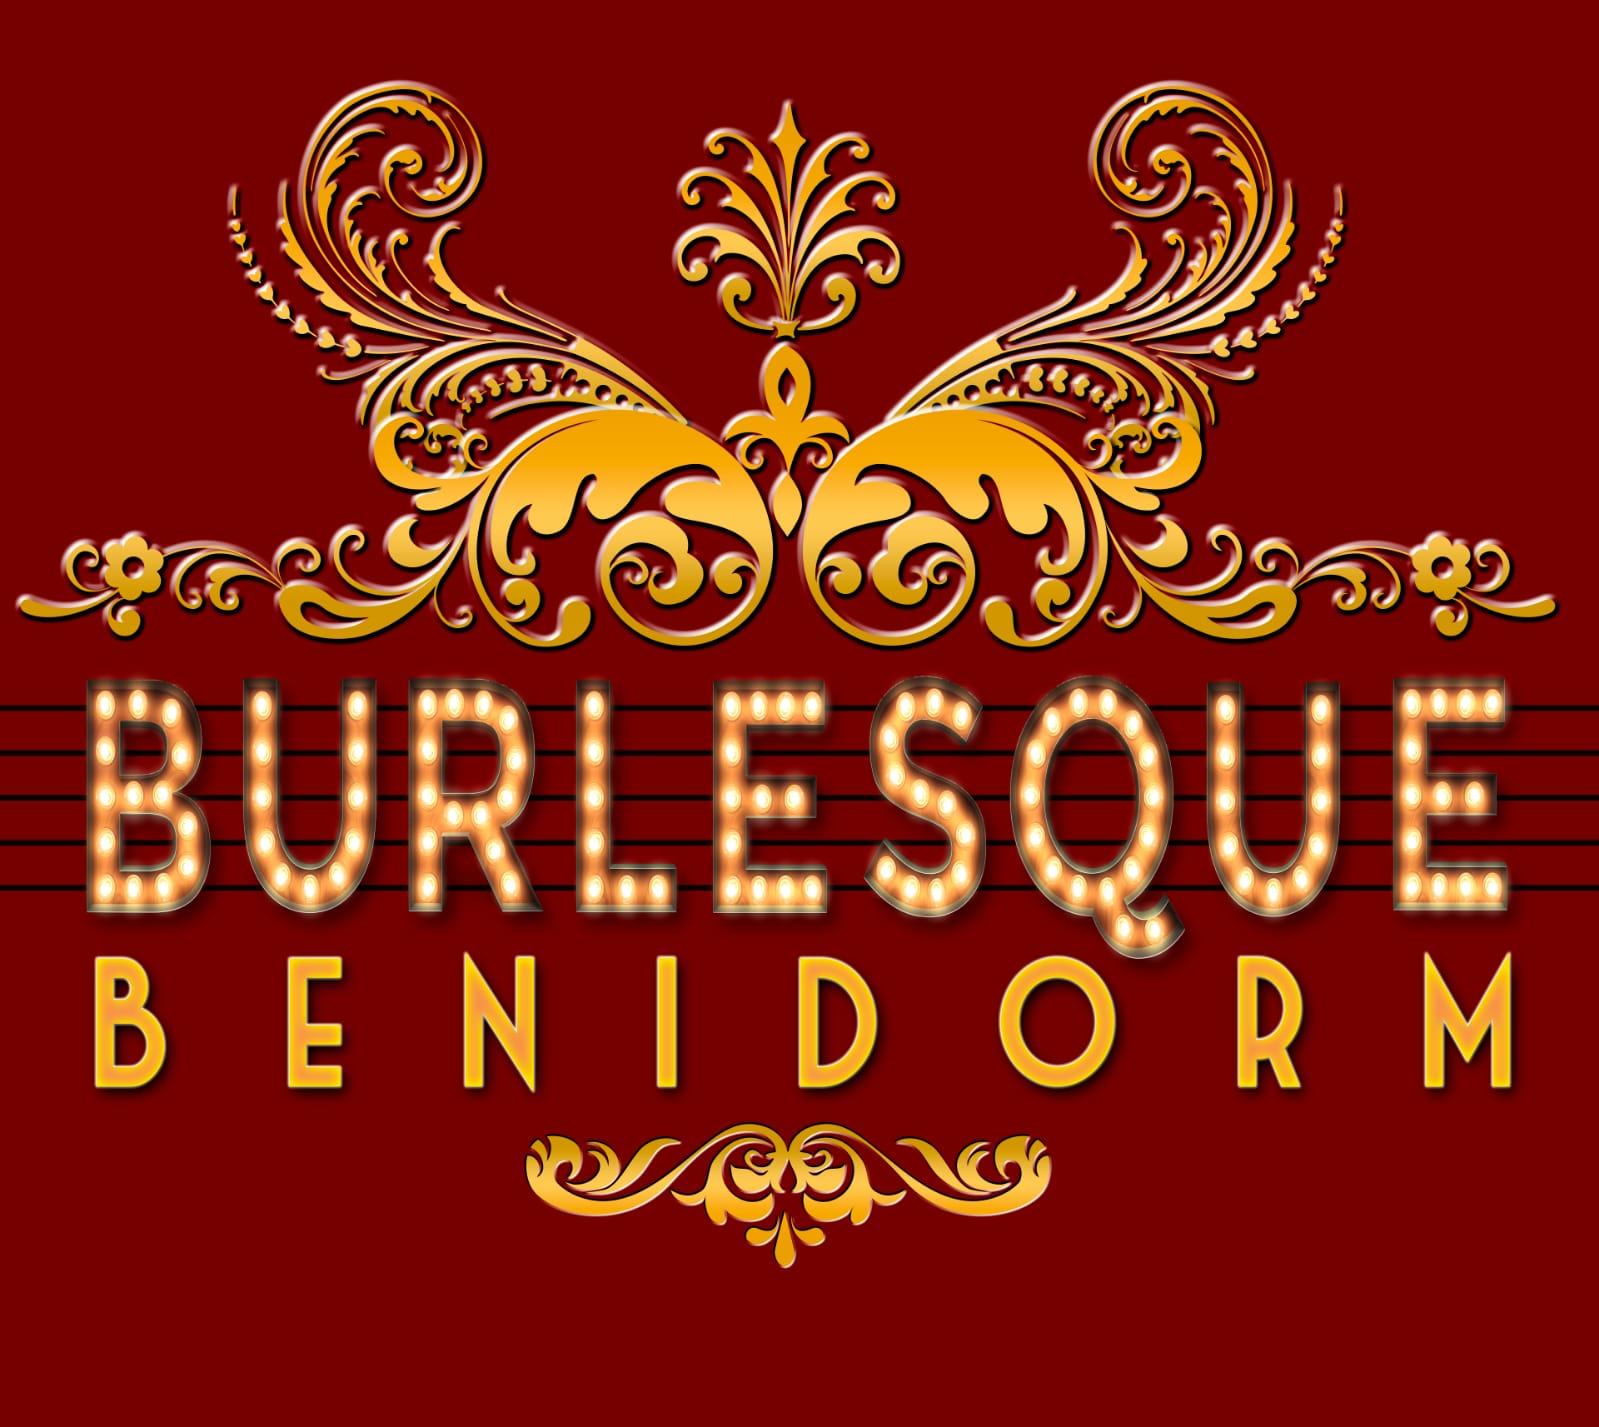 BURLESQUE BENIDORM